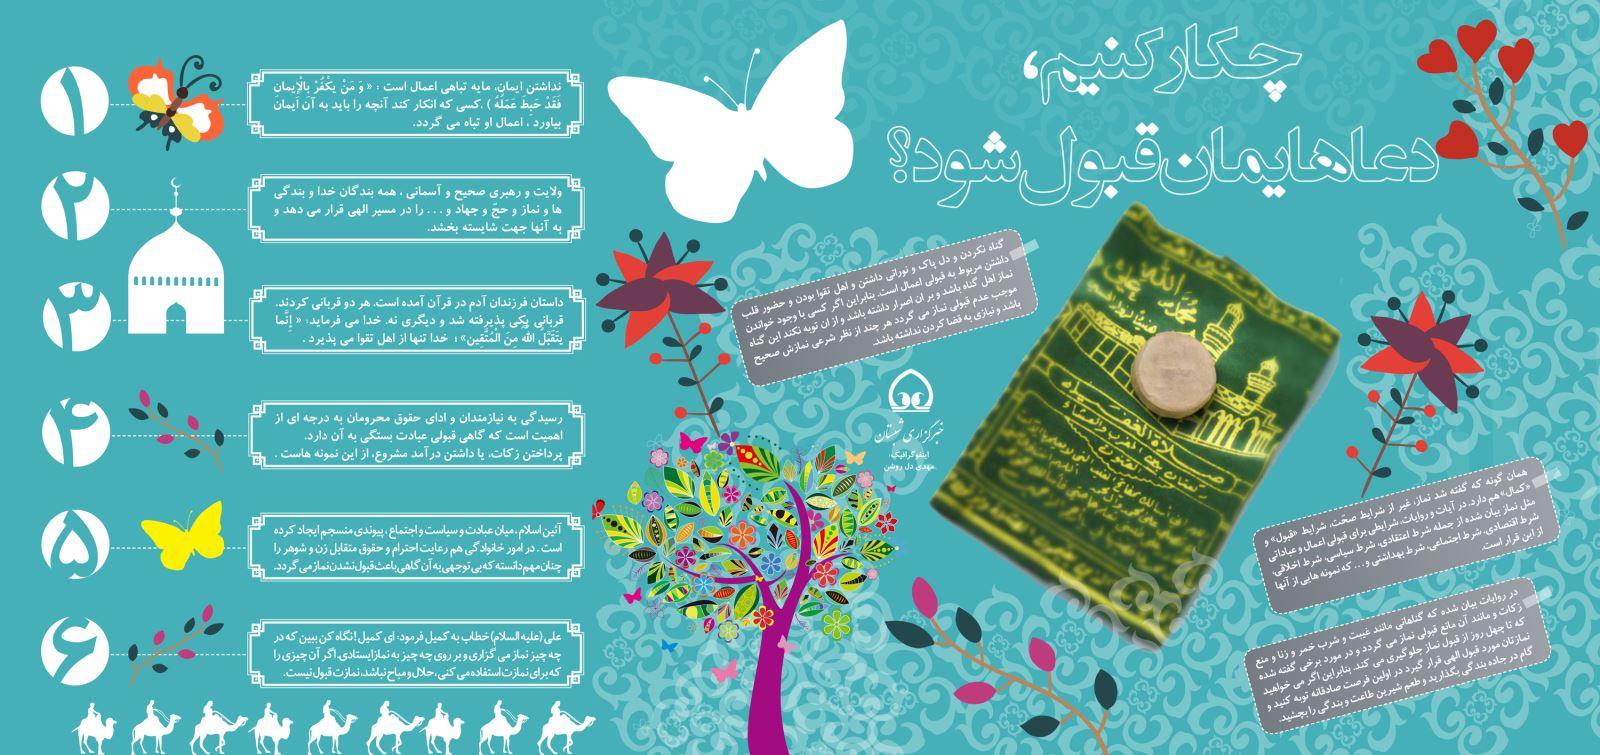 http://media.shabestan.ir/editor/dowa-02.jpg